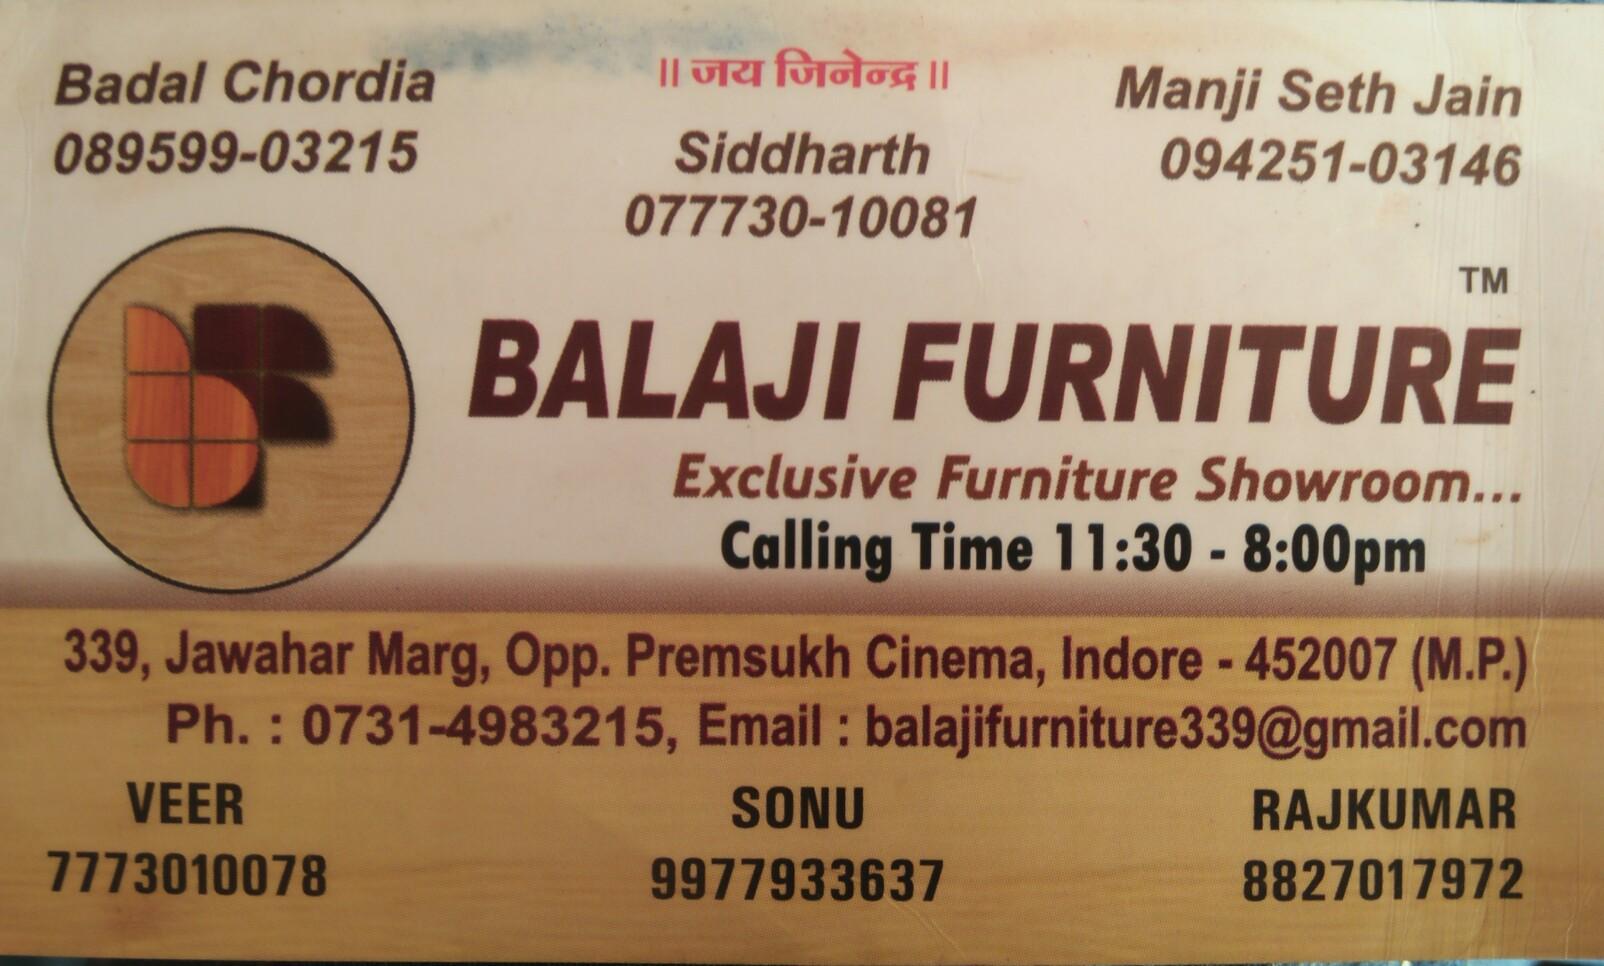 Balaji furniture